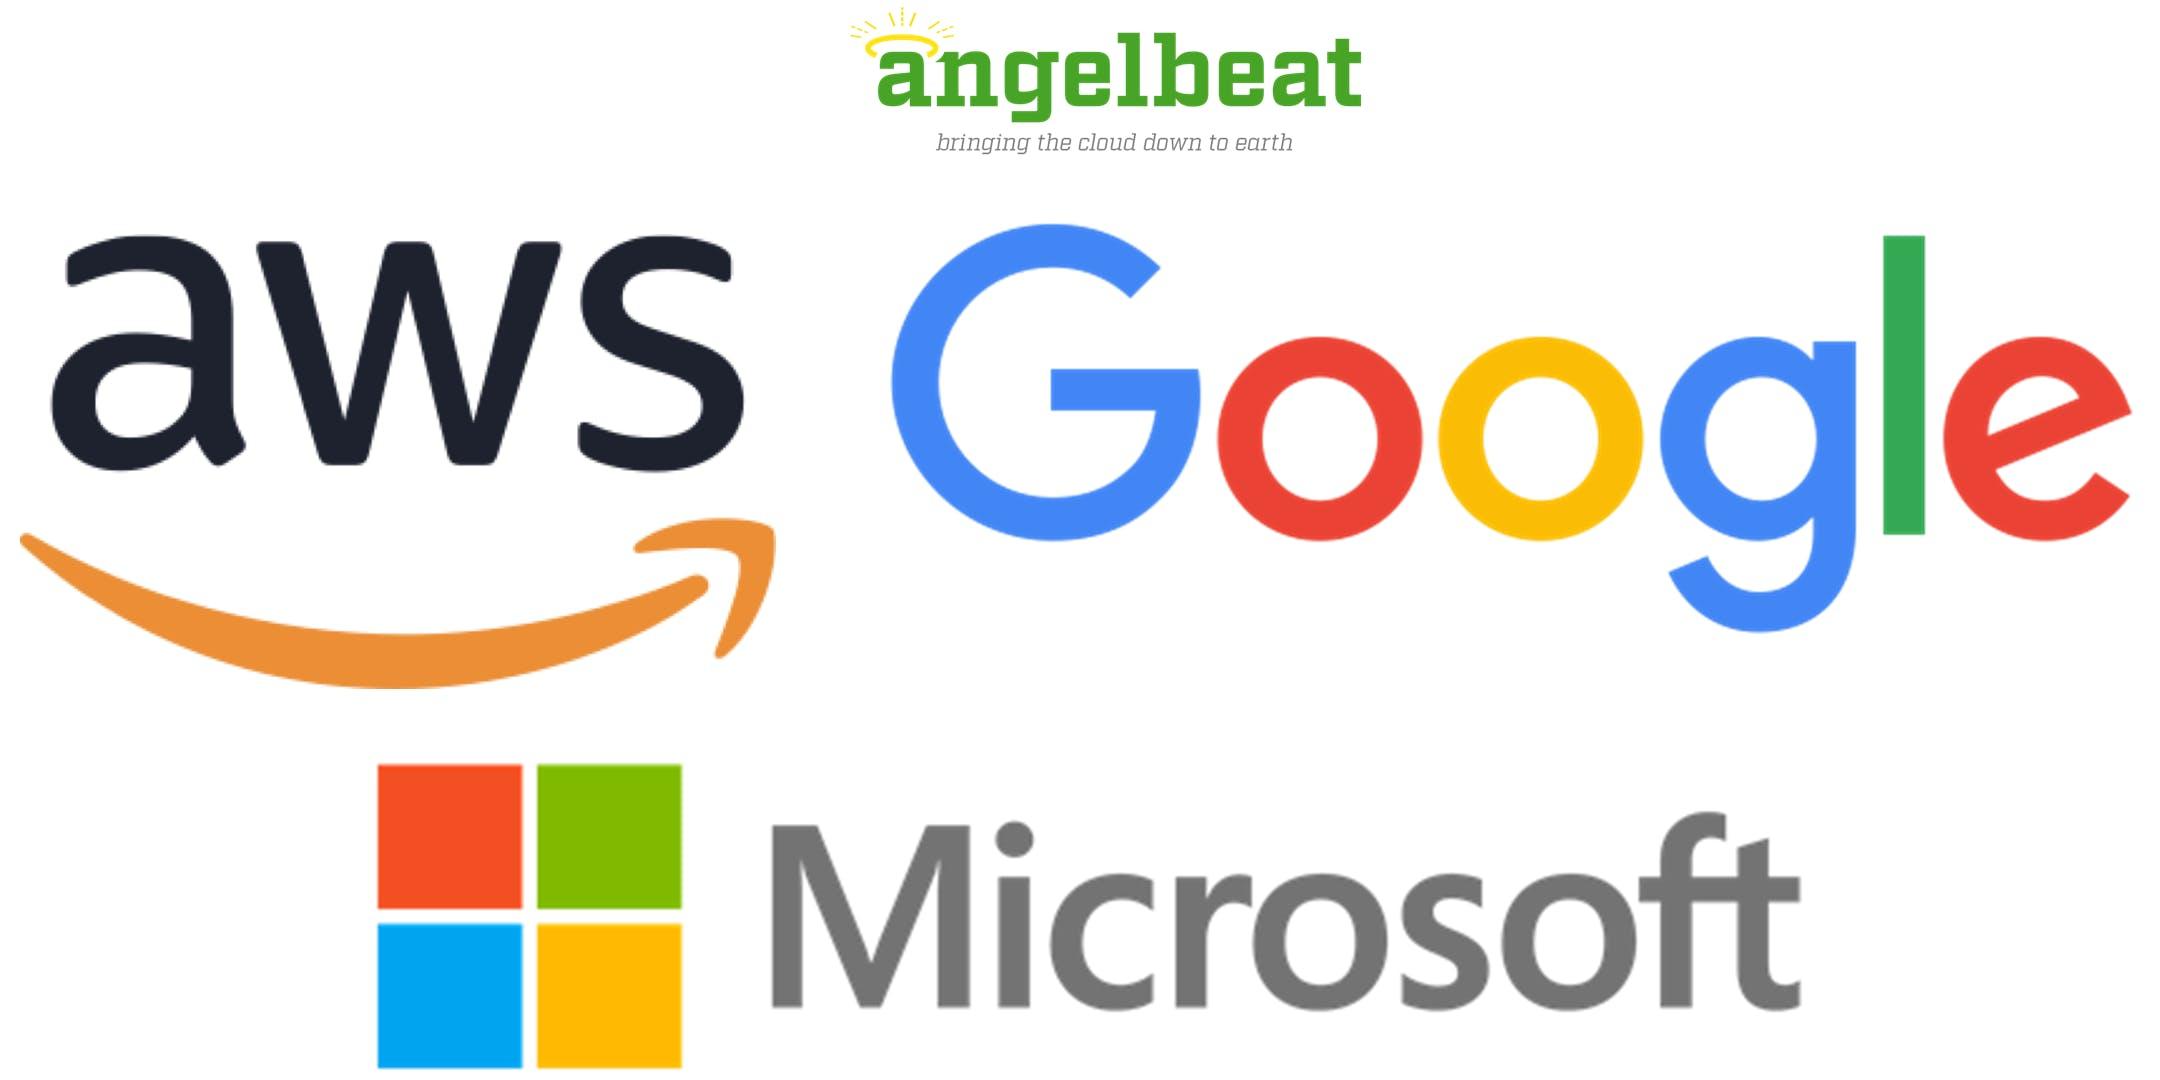 Angelbeat Technology Seminar on Cloud/Securit